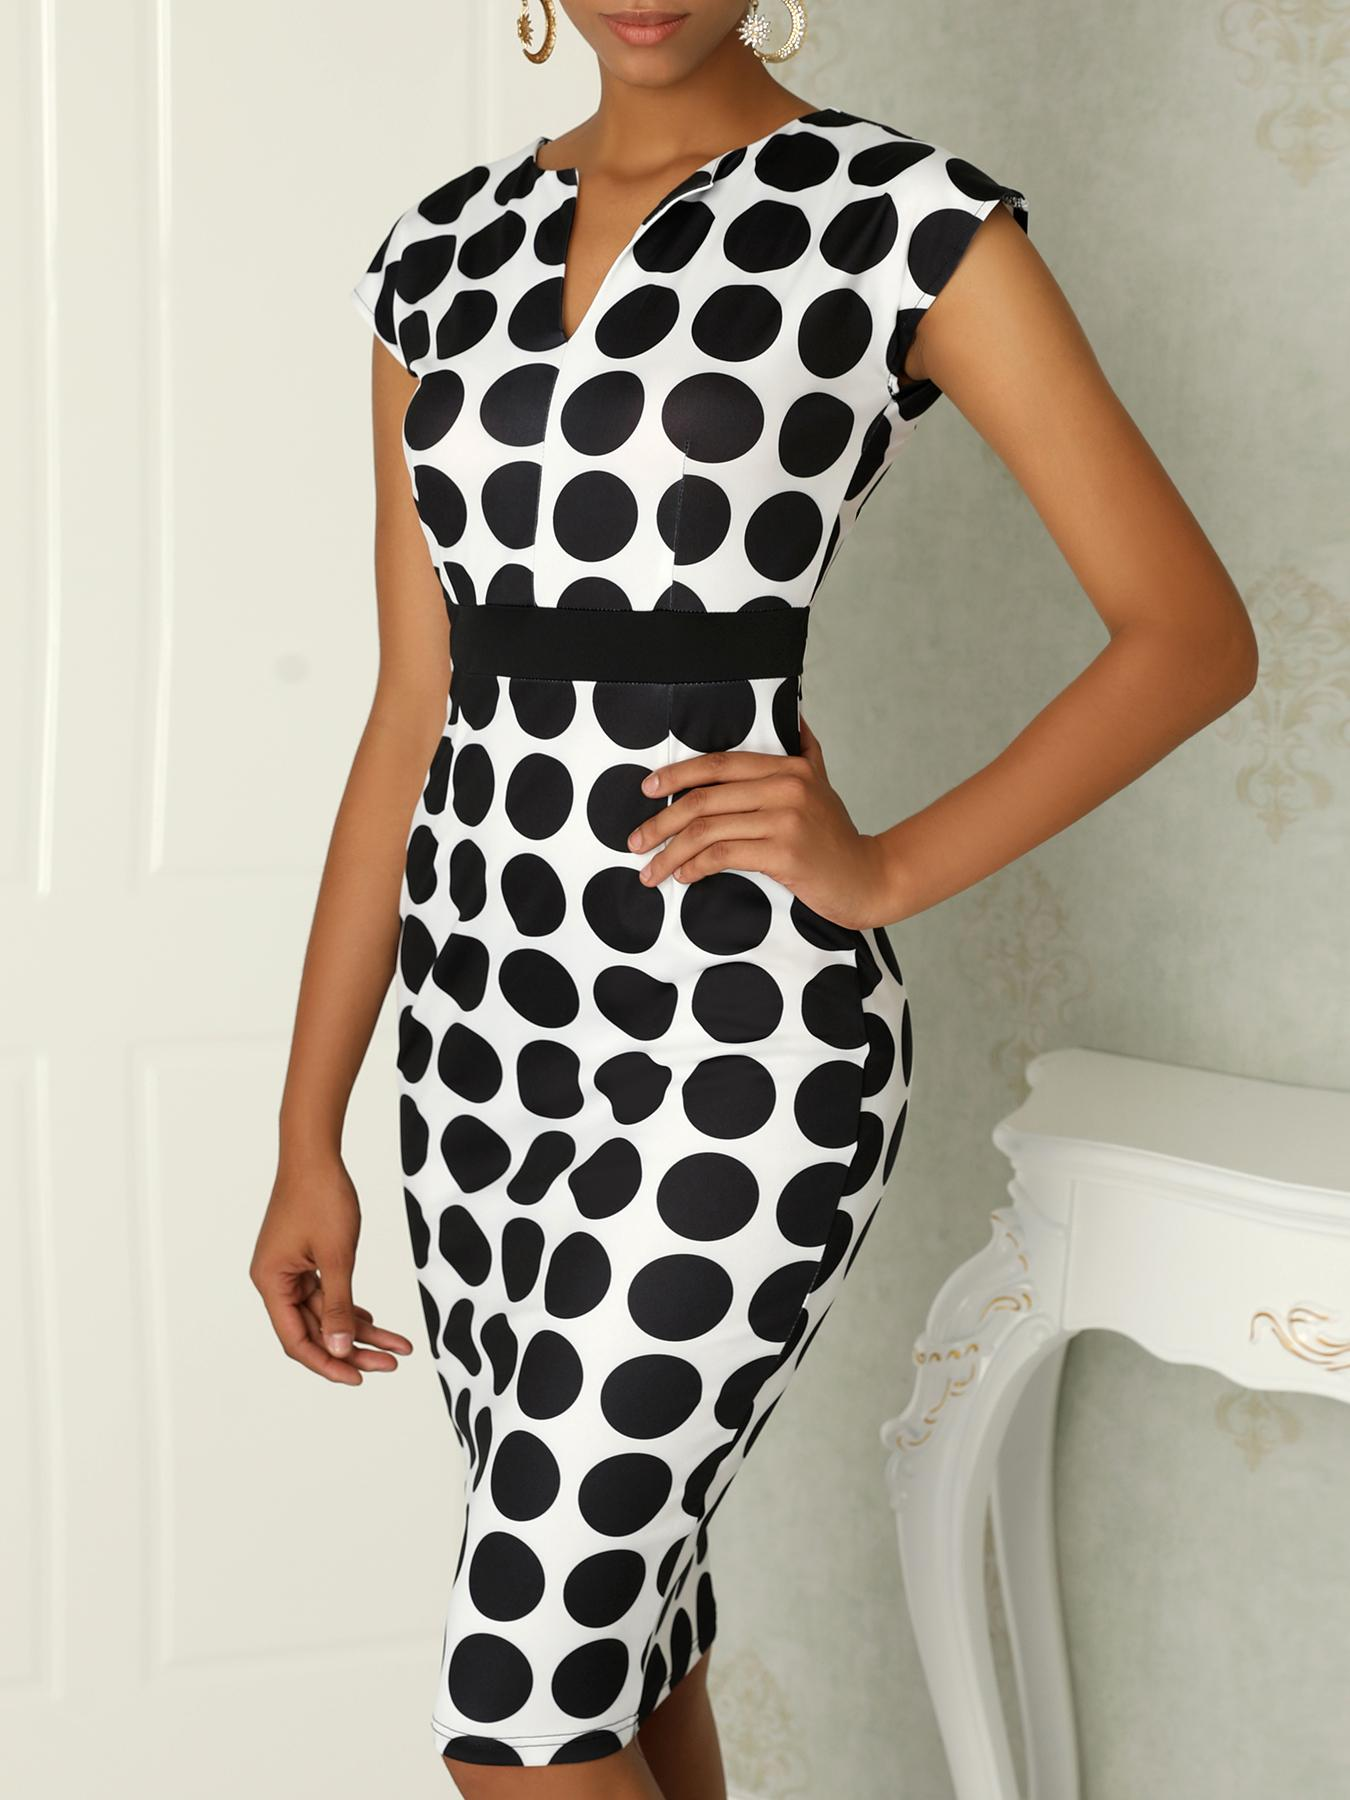 Formal Polka Dot Print V Neck Sheath Dress